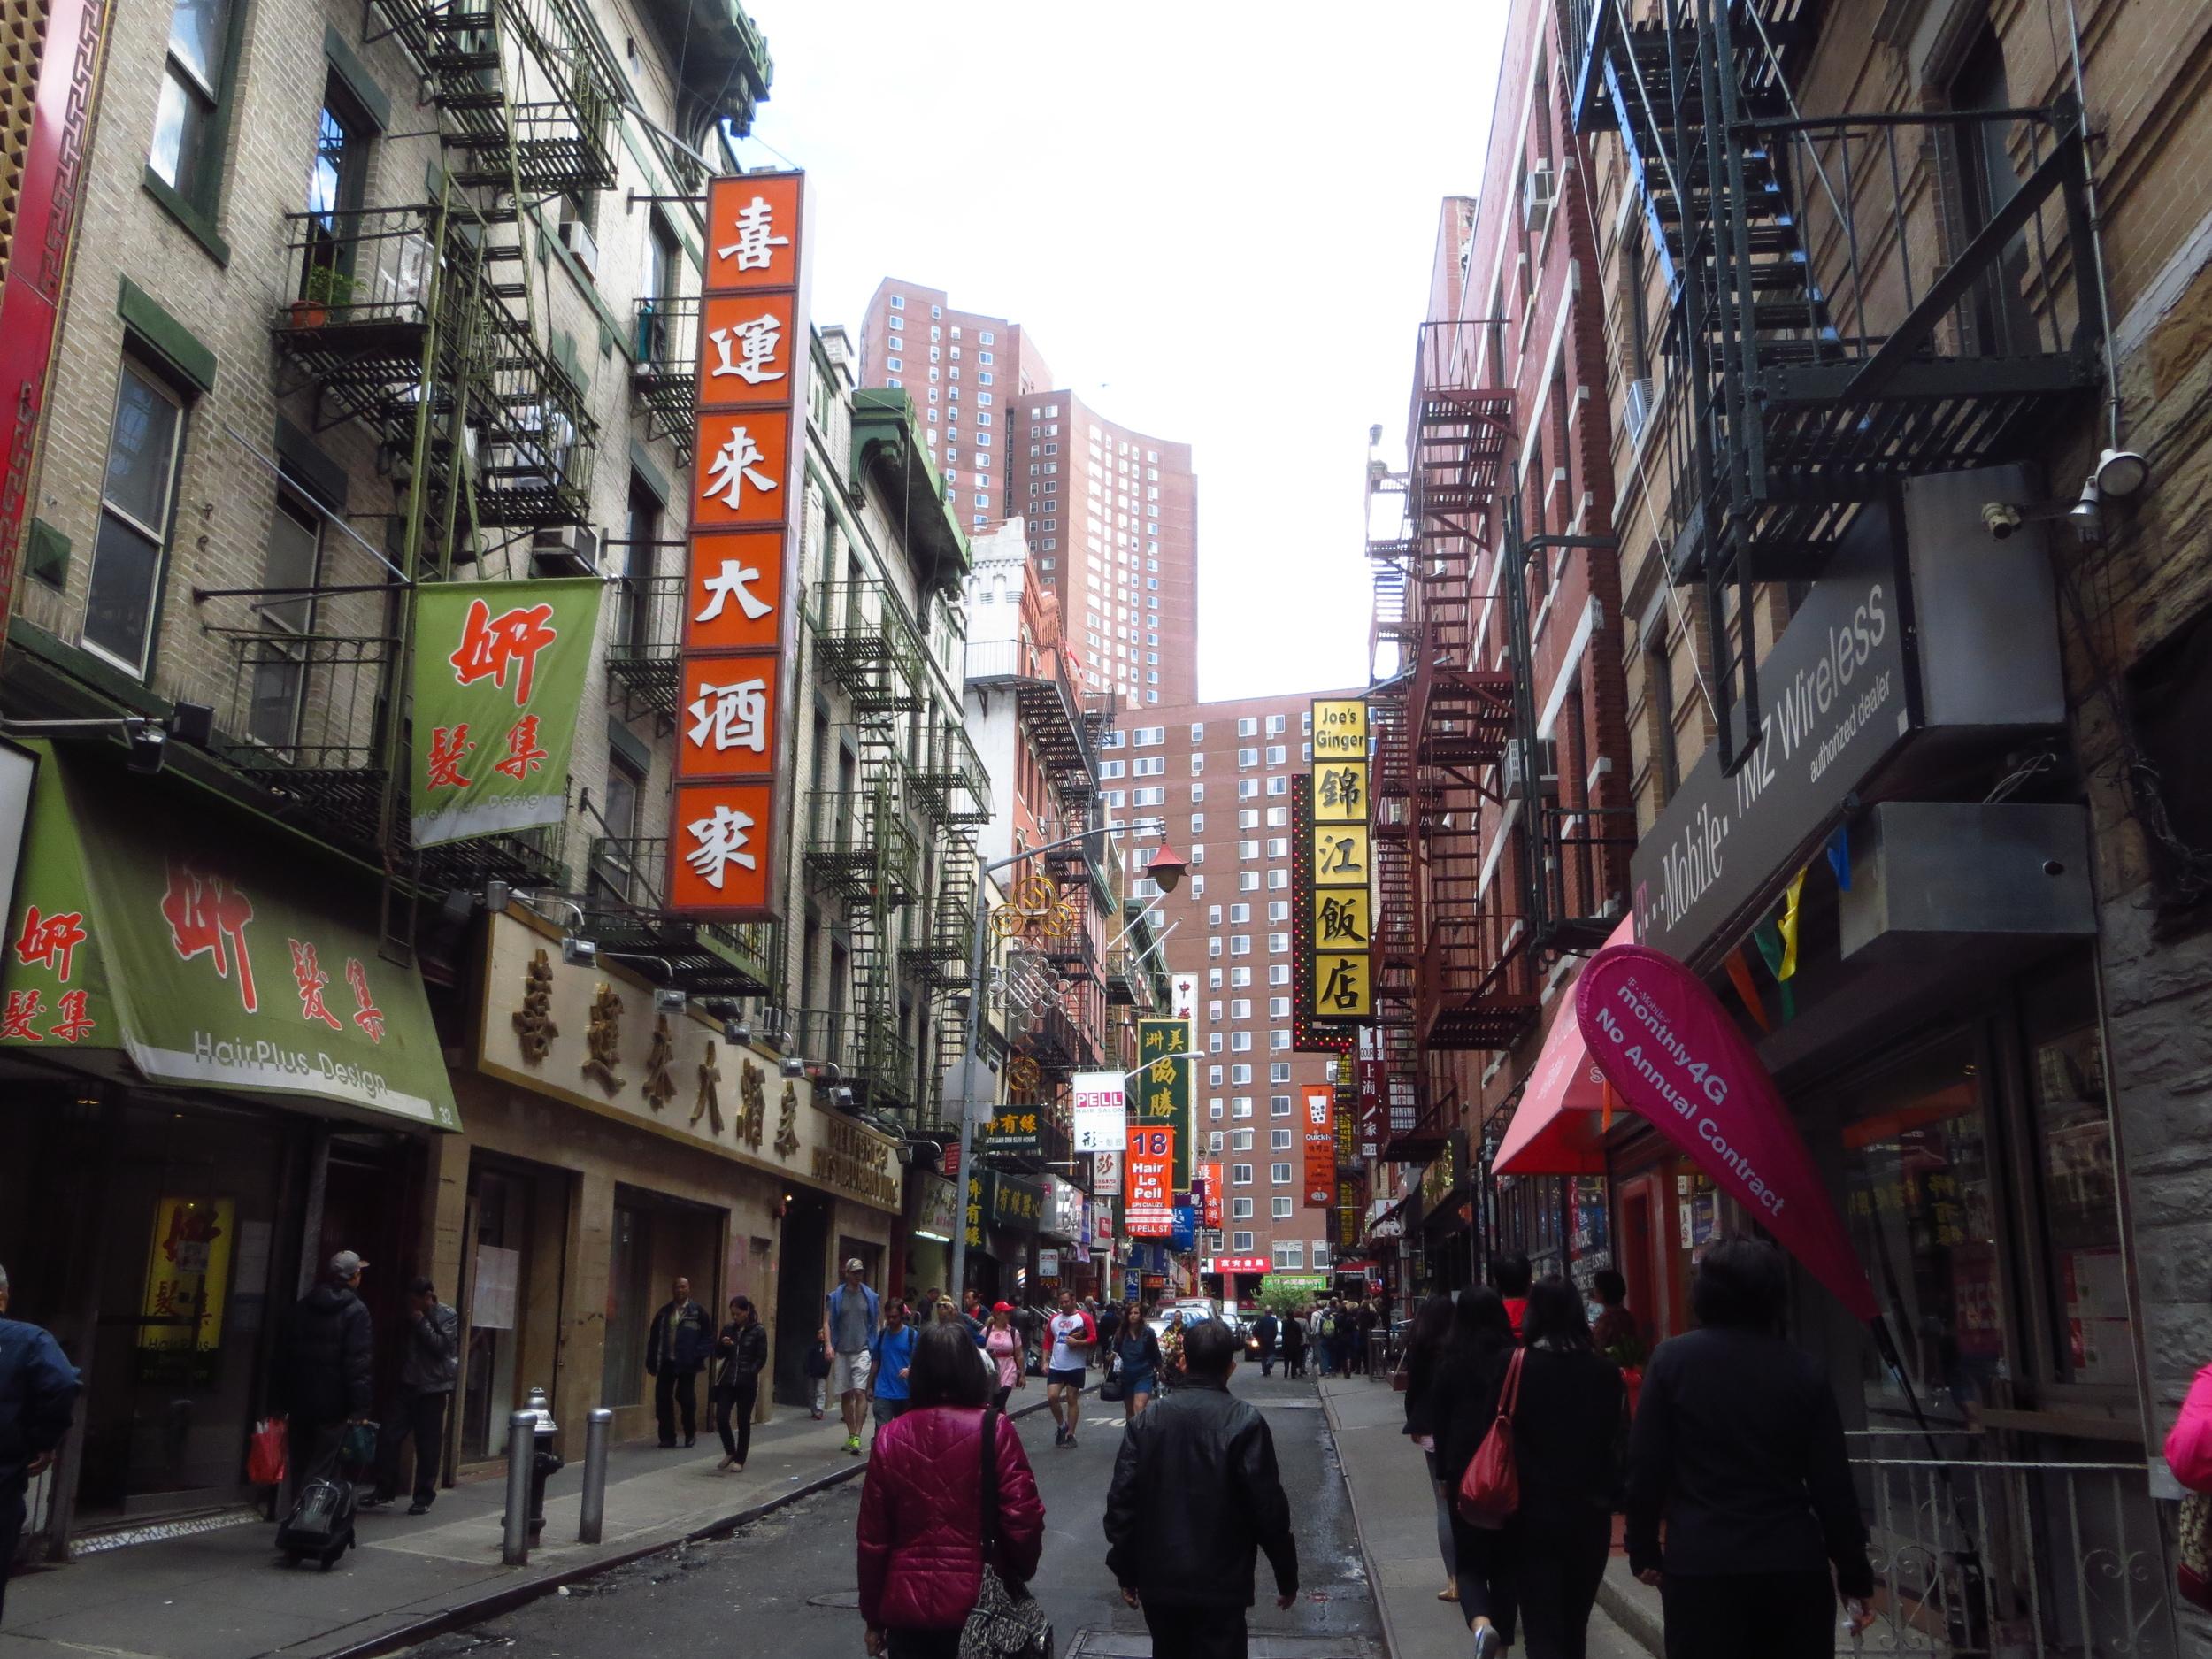 Mott St. in Chinatown